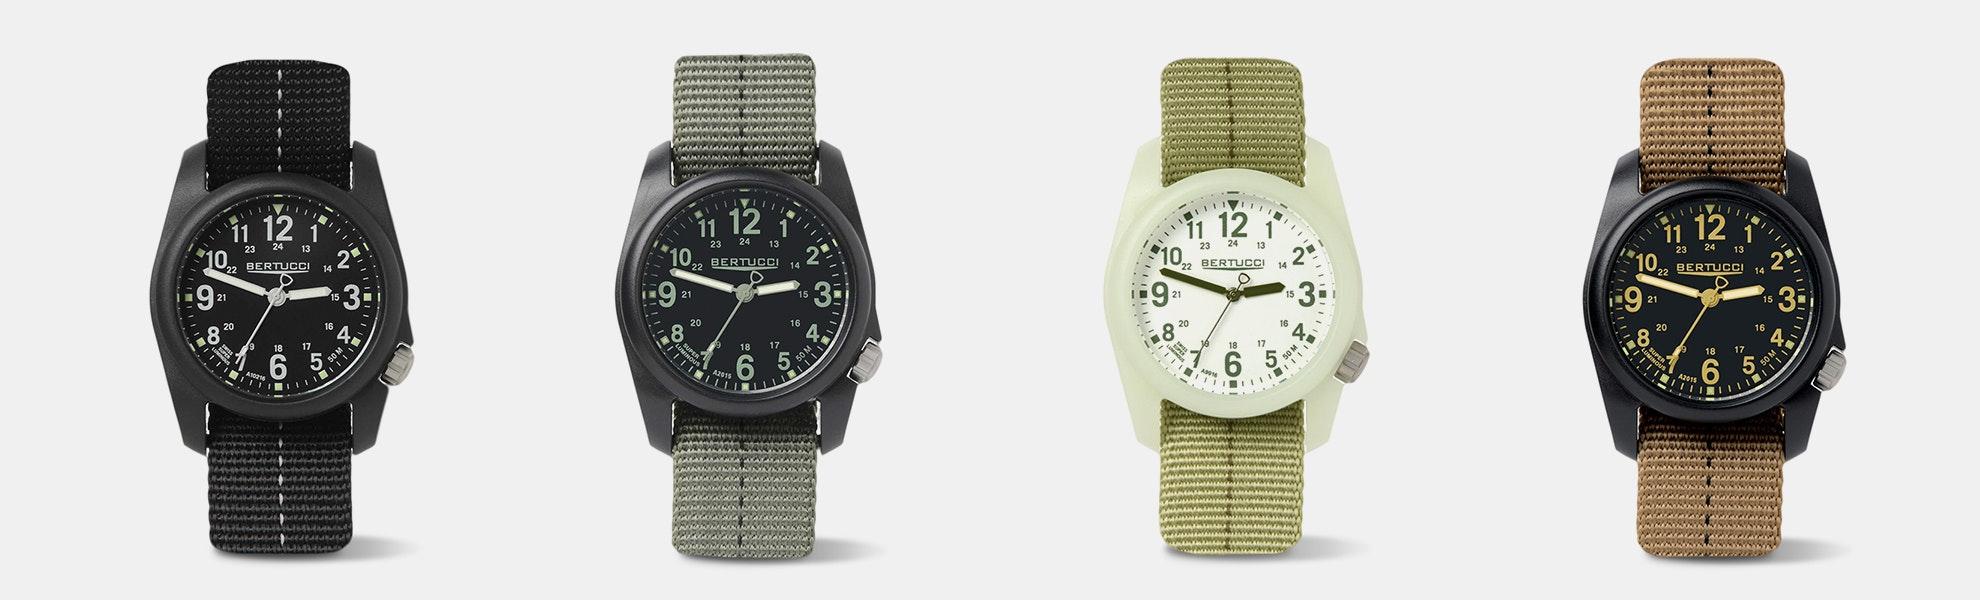 Bertucci DX3 Performance Field Watch